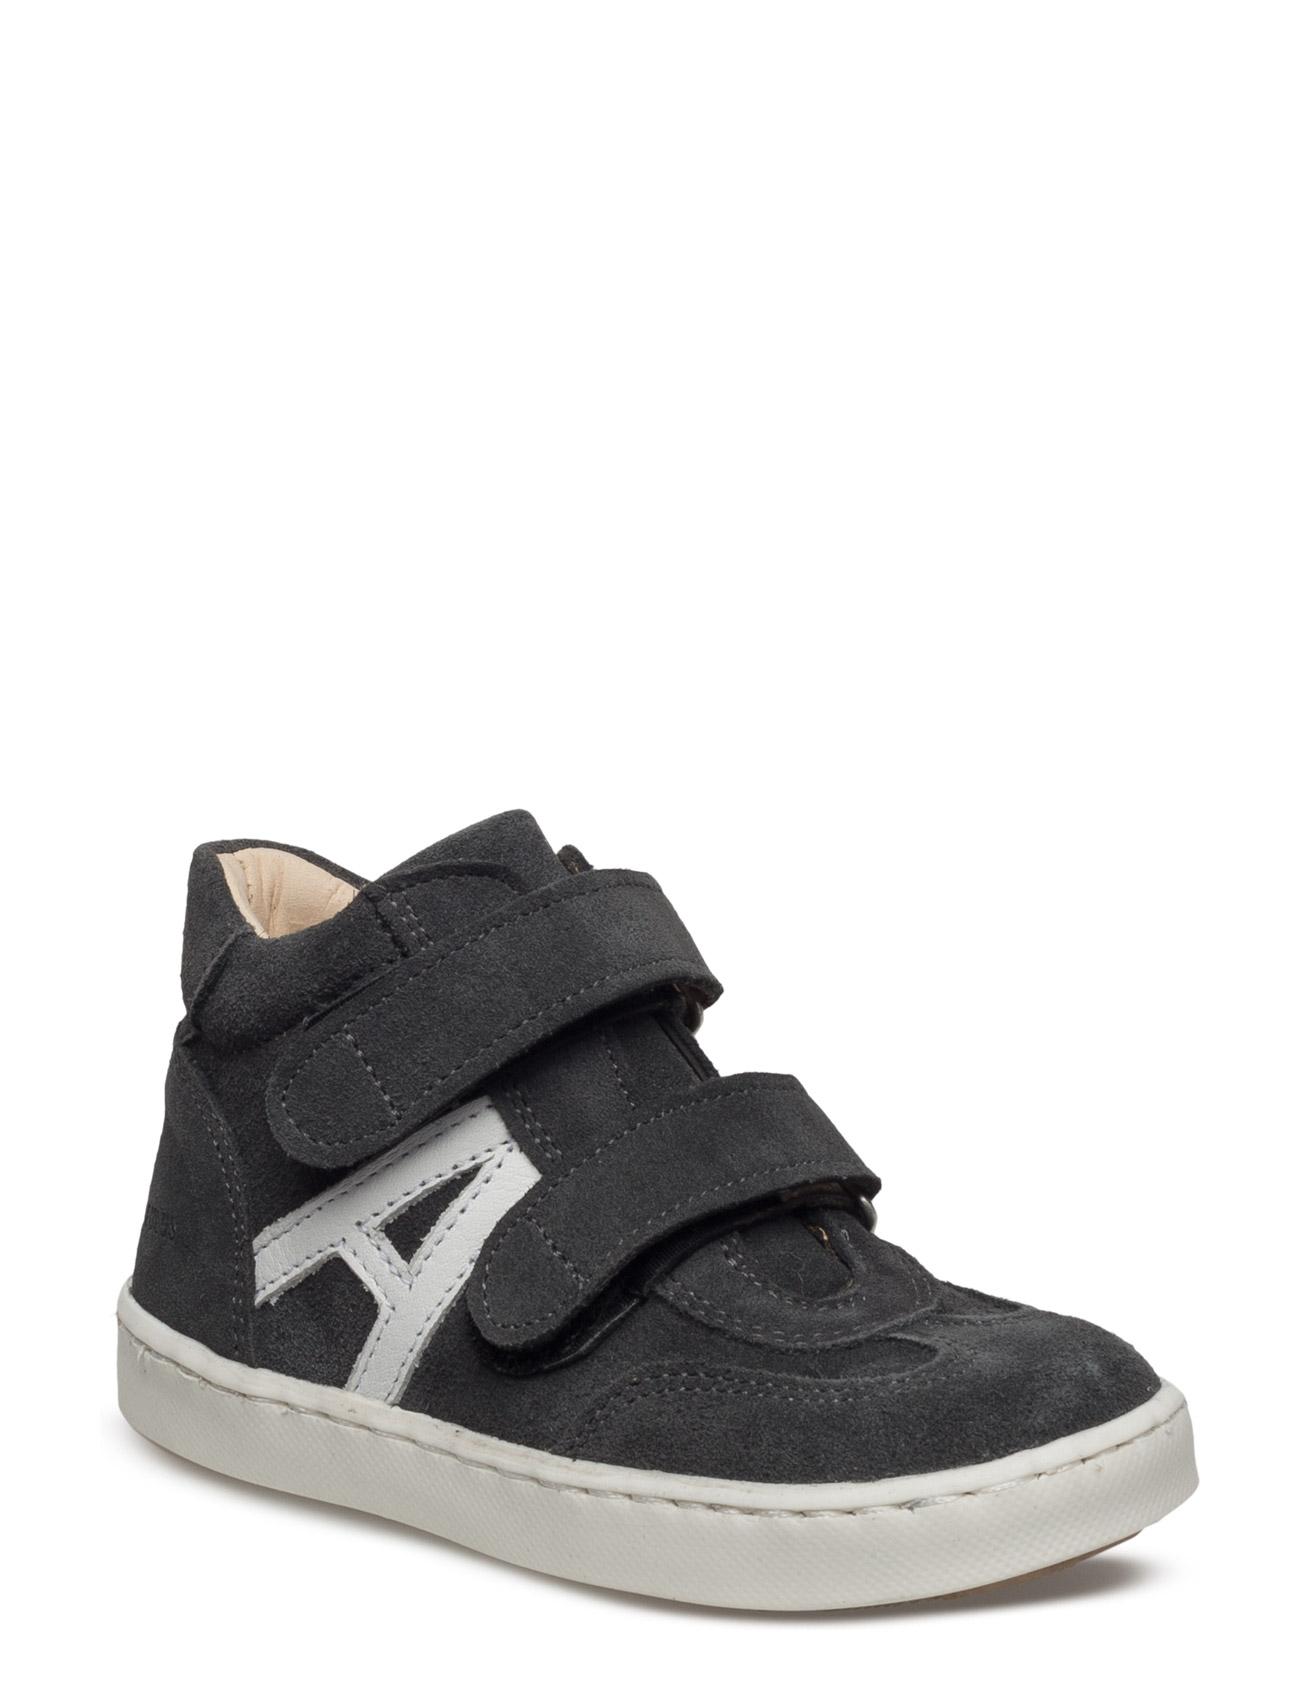 Shoes - Flat - With Velcro ANGULUS Sko & Sneakers til Børn i